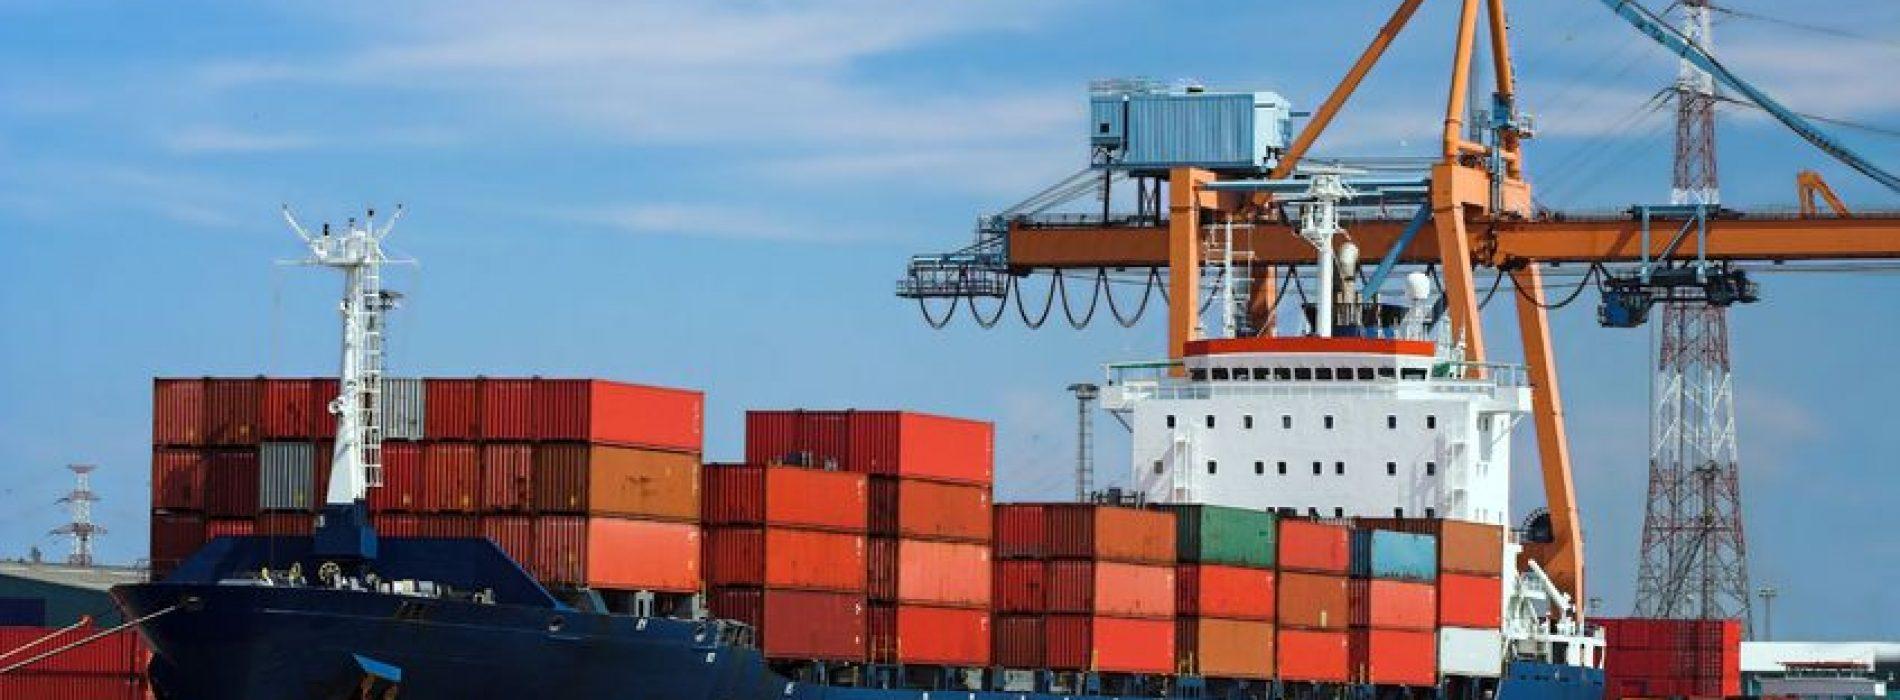 L'Africa deve eliminare le barriere al commercio regionale